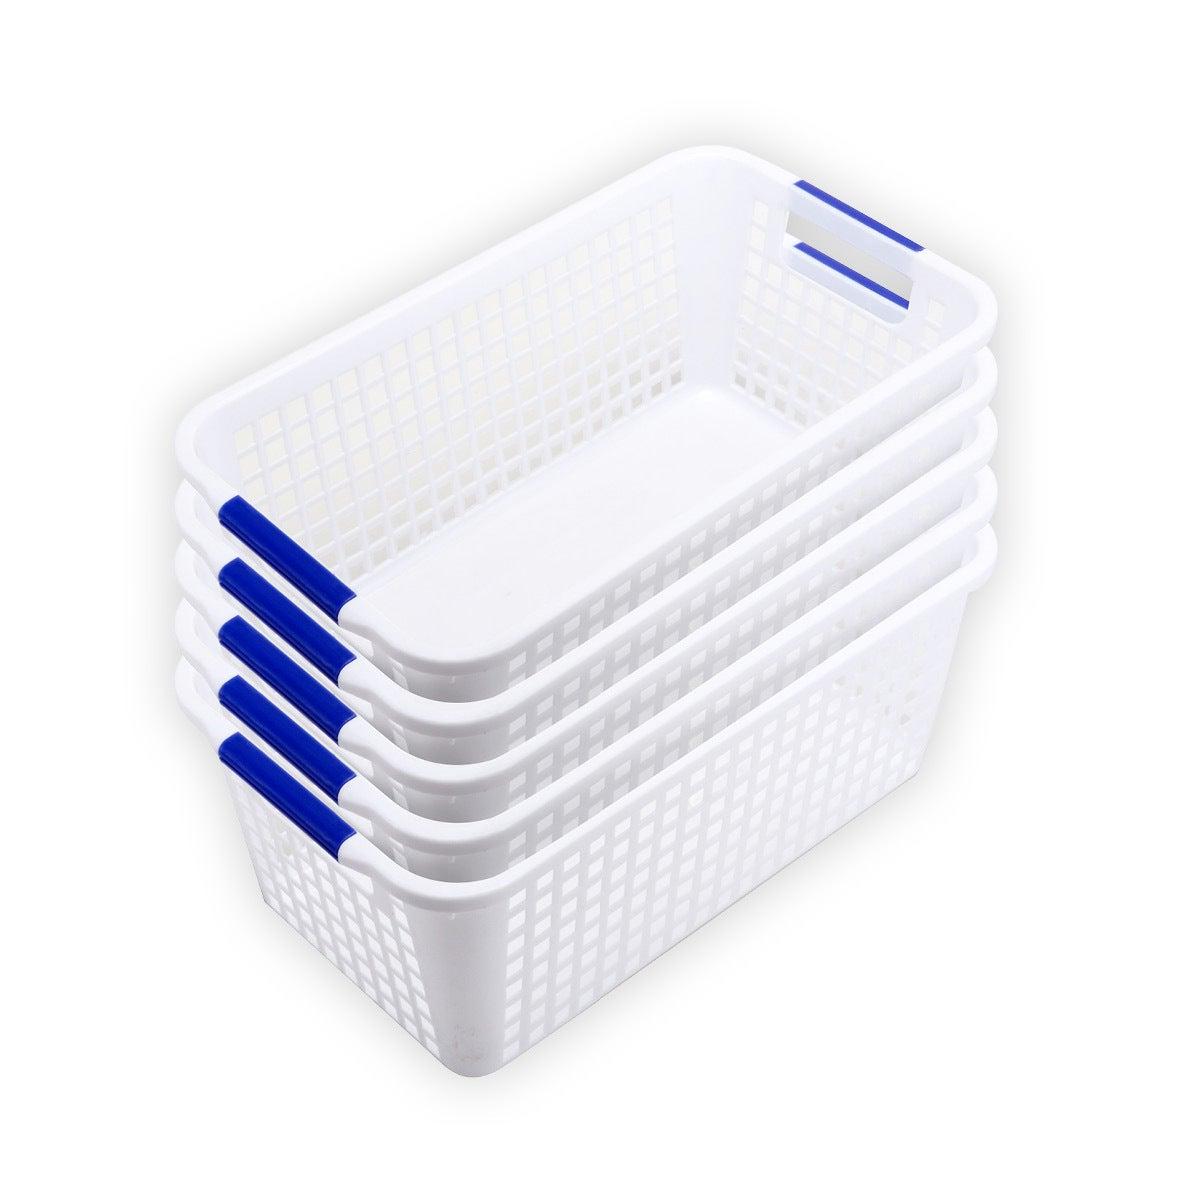 Home Master® 5PCE Storage Baskets Multi Purpose Space Saving 16 x 30 x 12cm